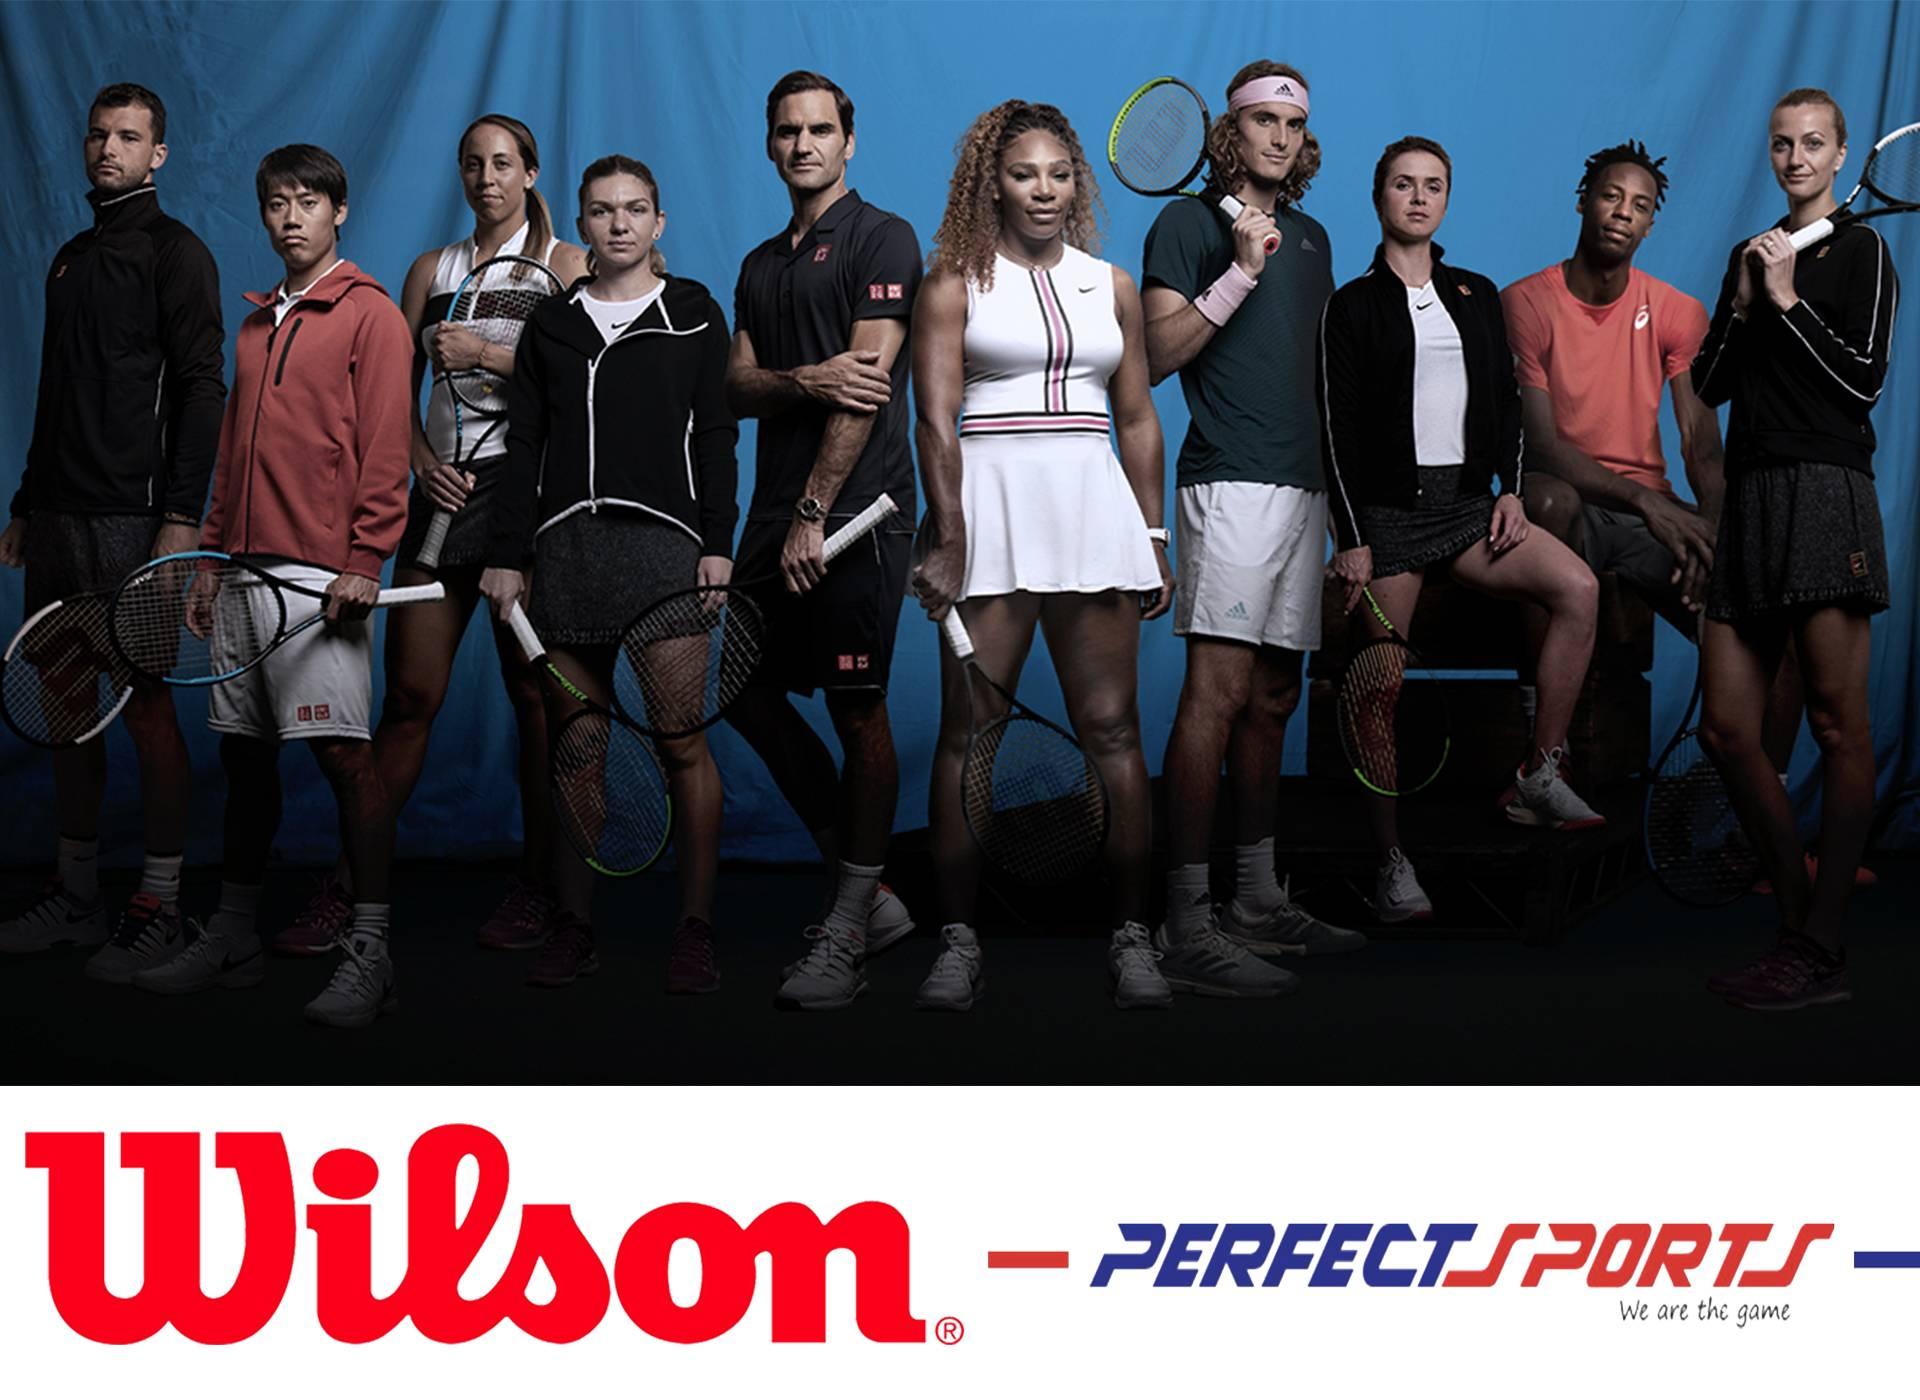 Wilson x Perfectsports